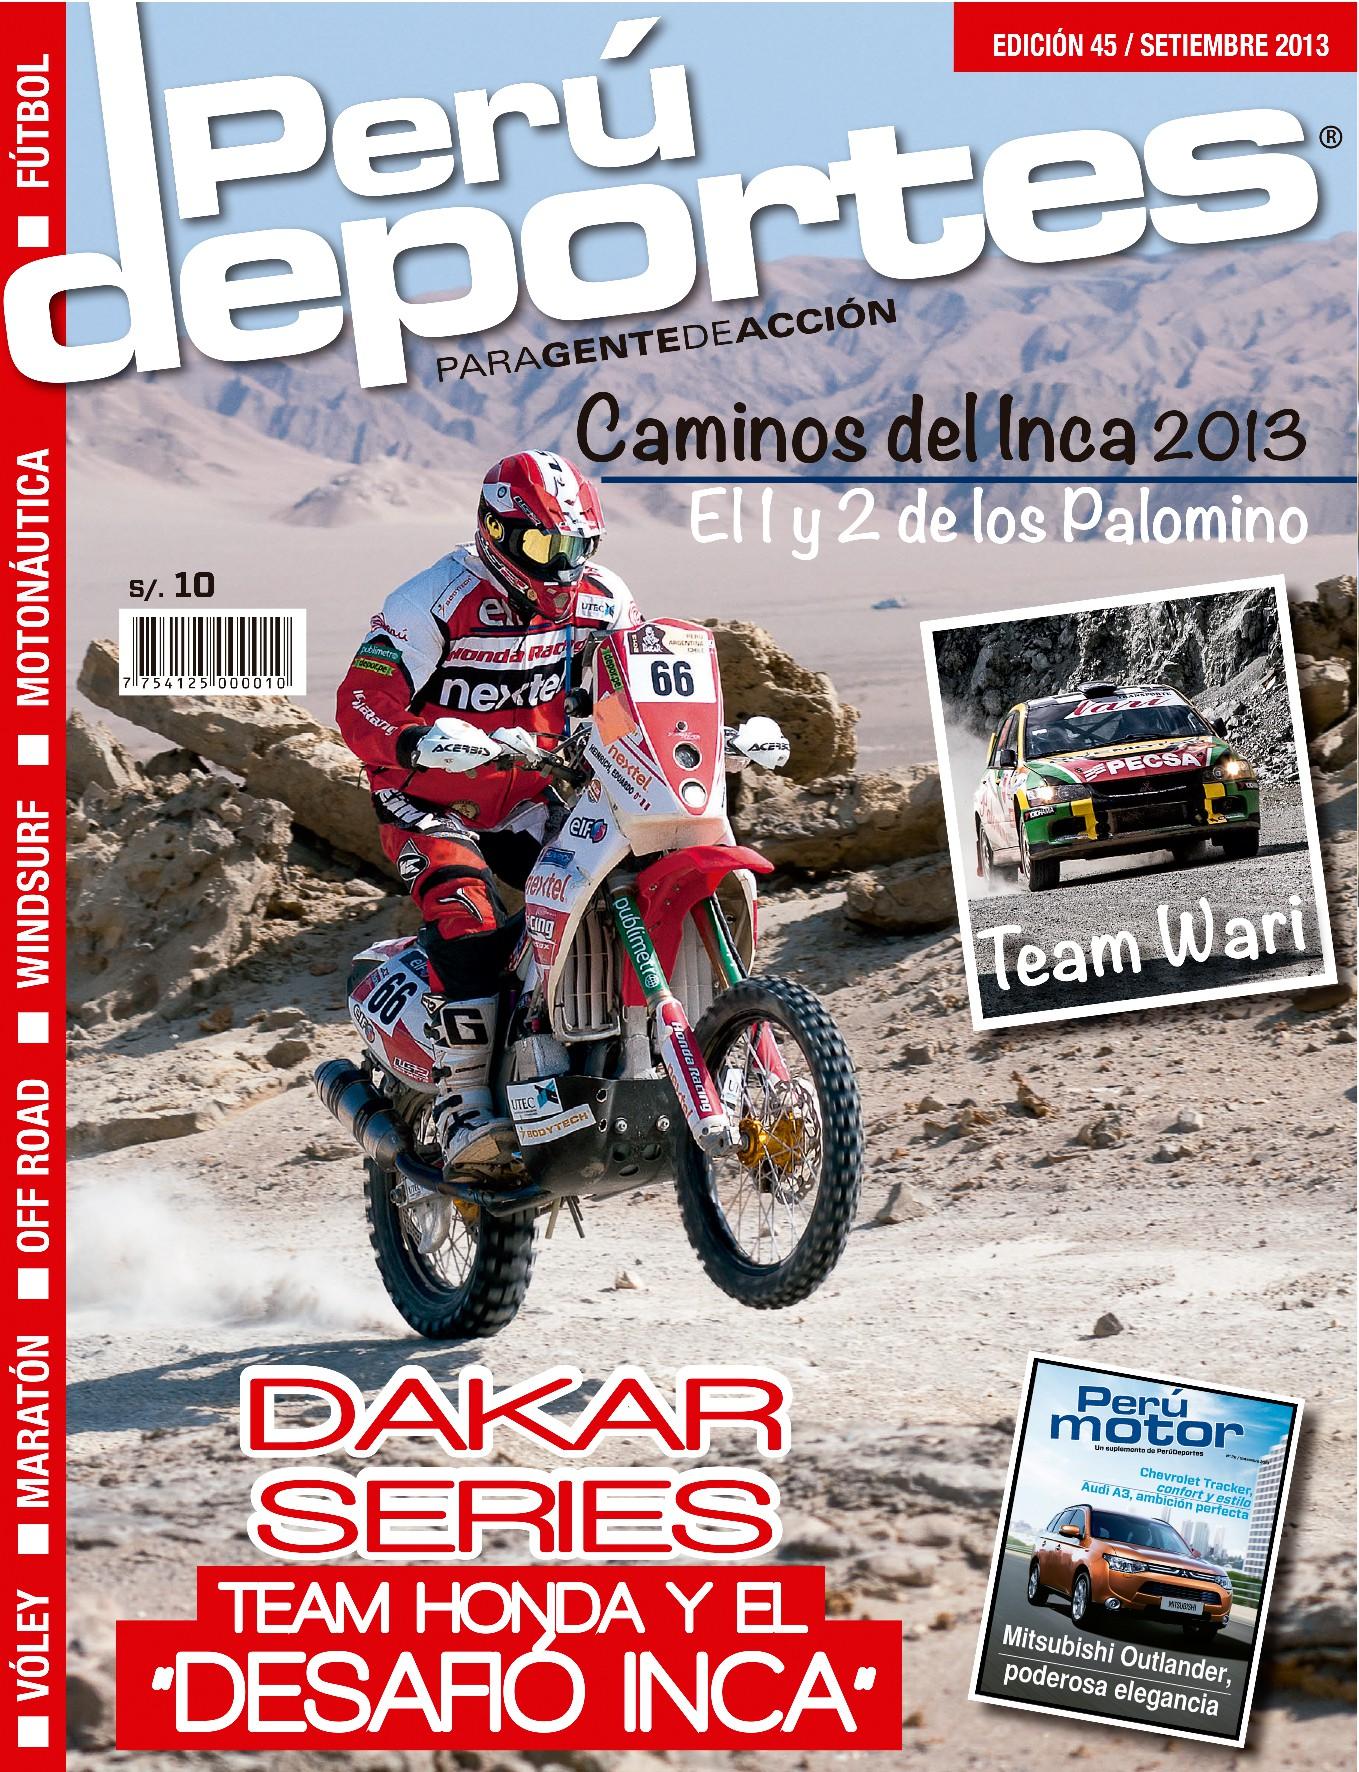 Perudeportes Edición #45 (Sep 2013)